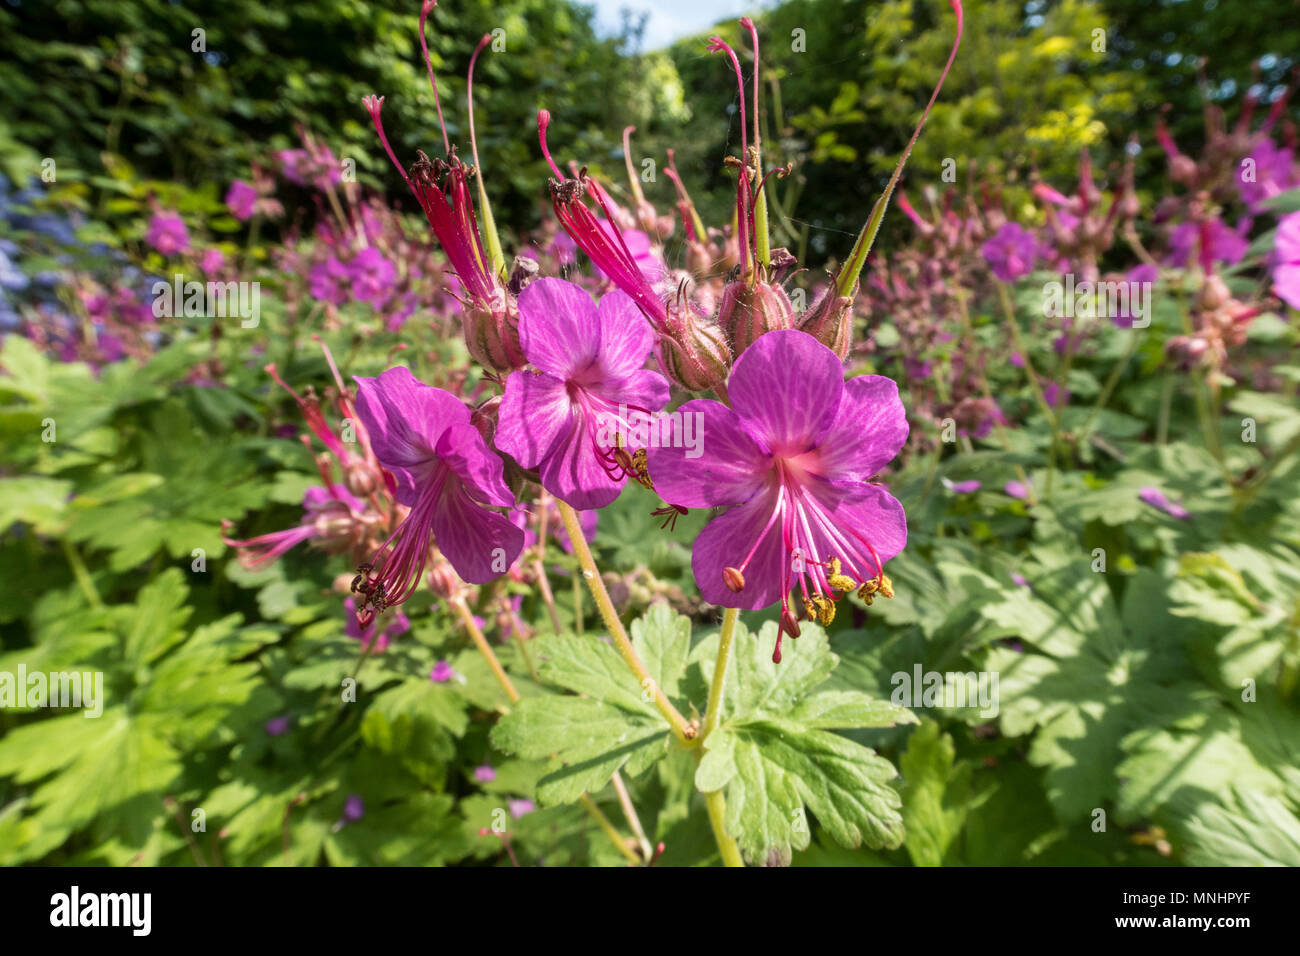 Geranium macrorrhizum providing ground cover in a Devon garden. - Stock Image